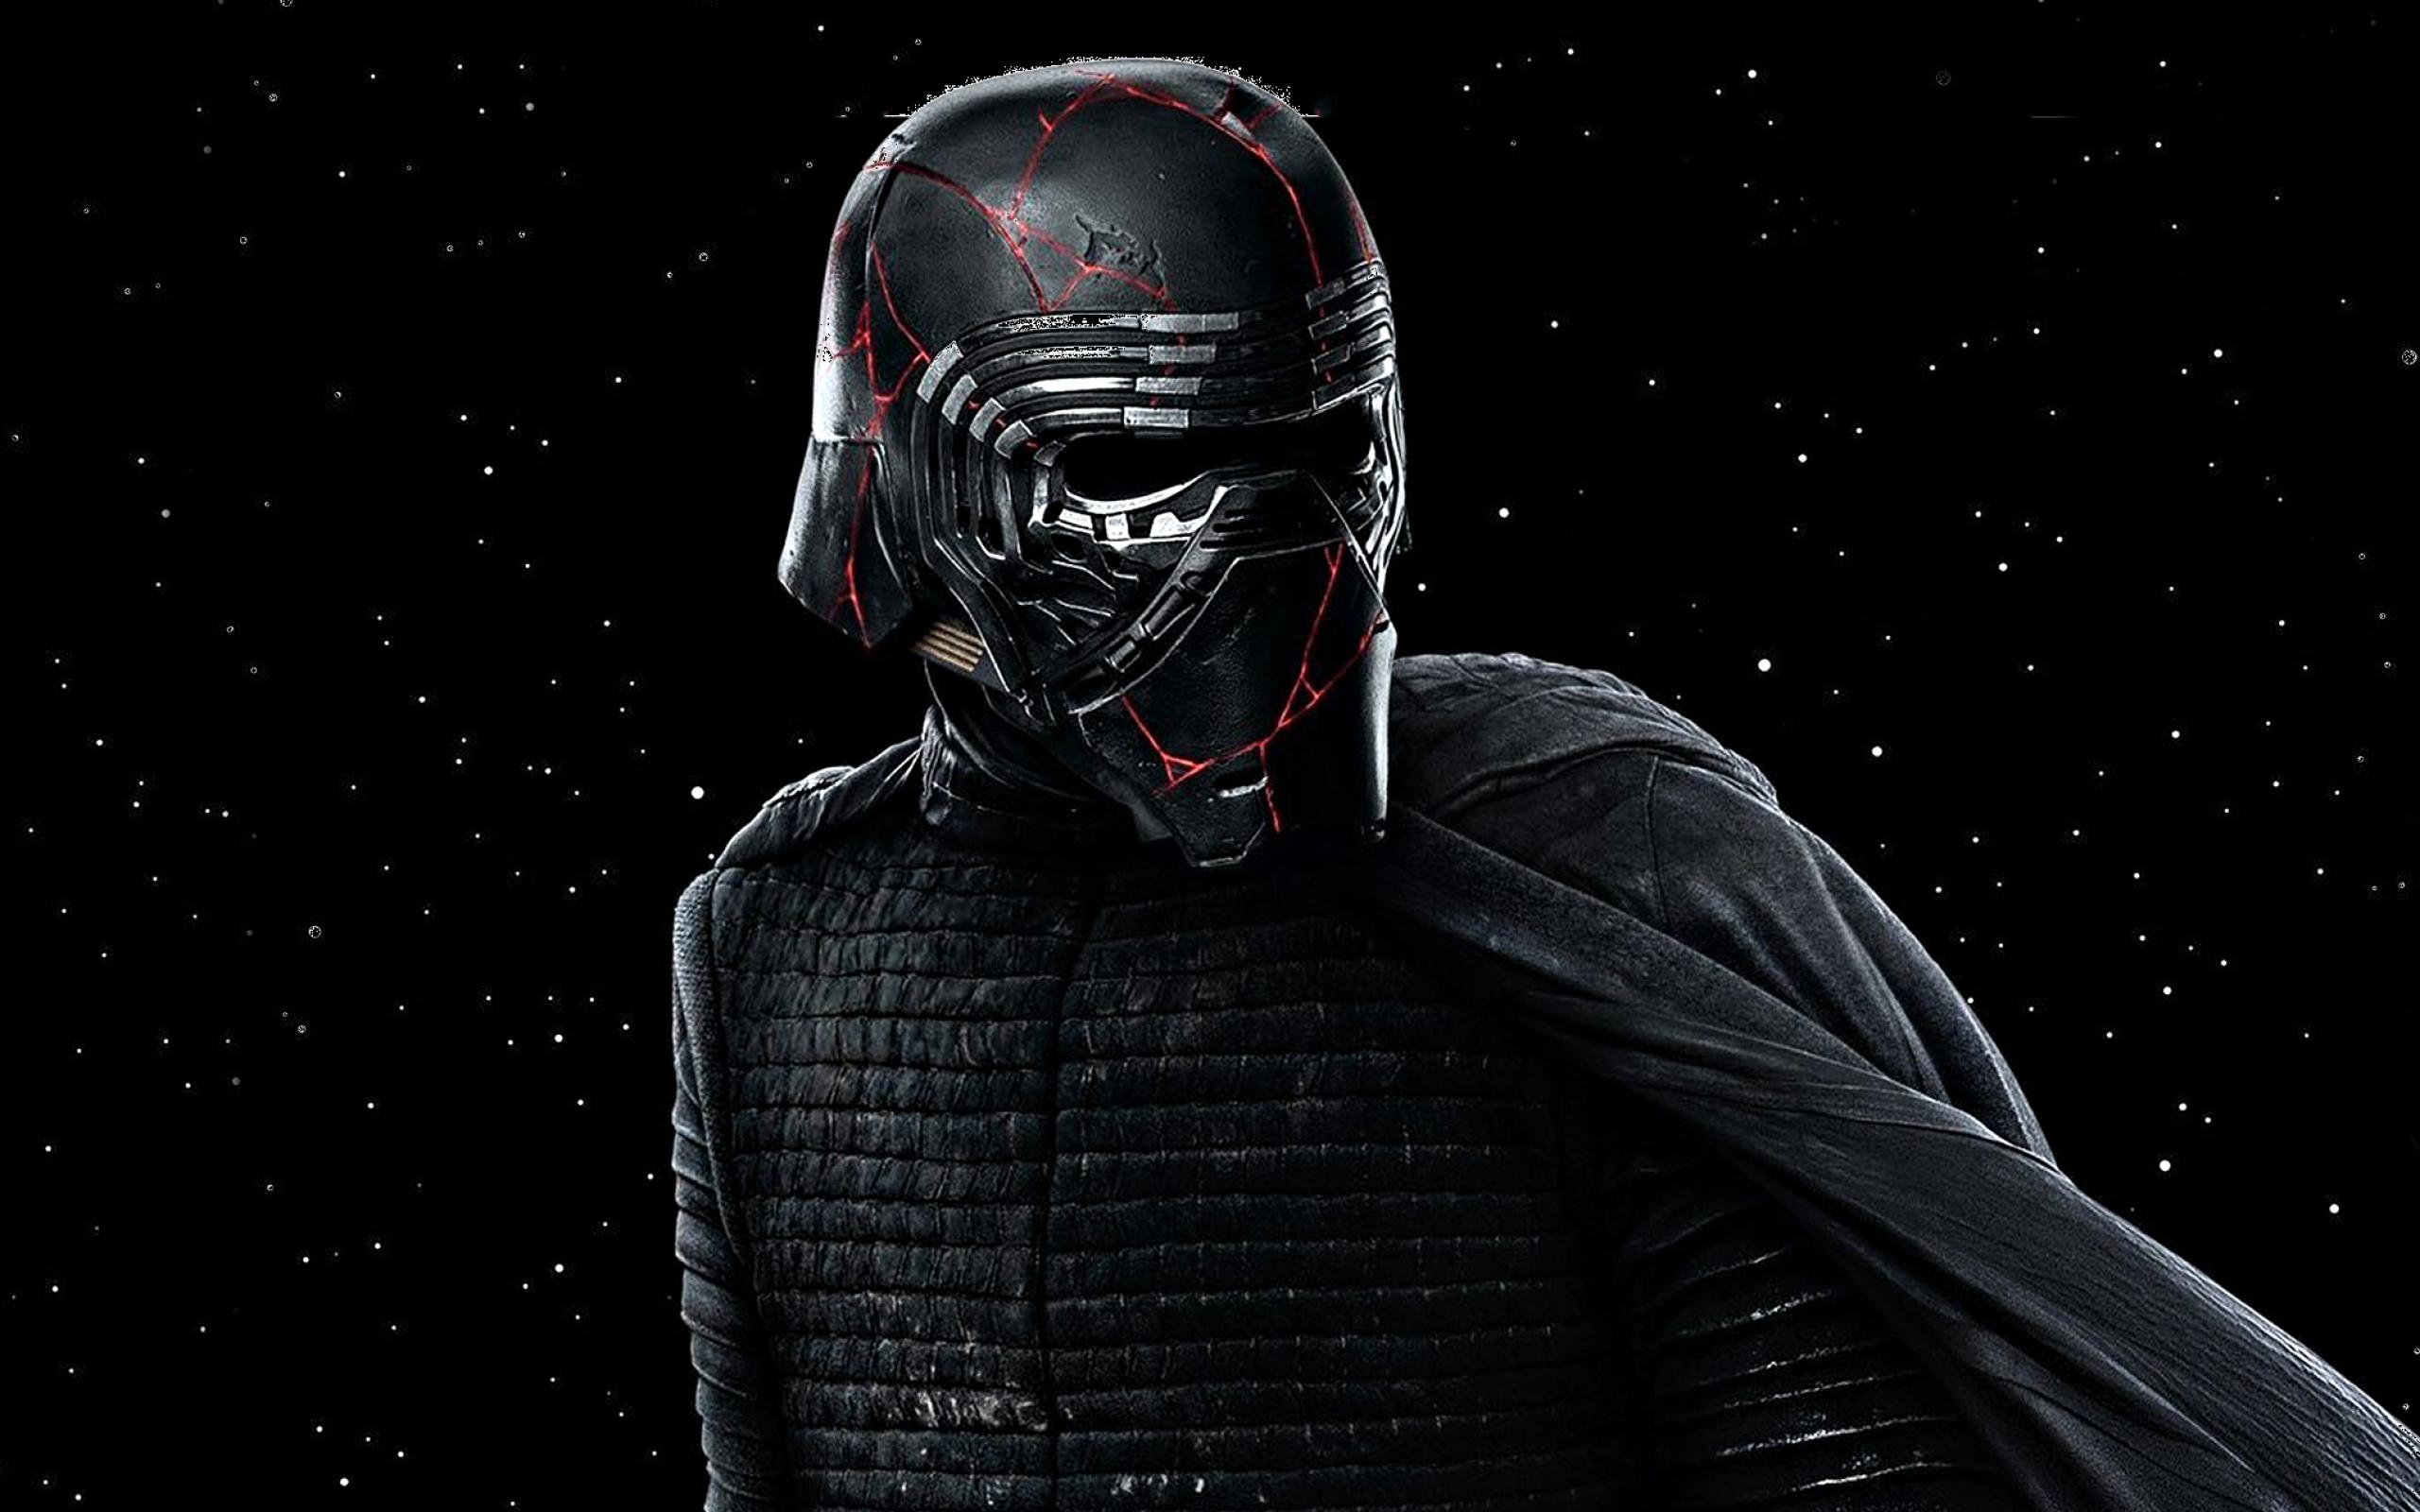 2560x1600 Cool Darth Vader 2560x1600 Resolution Wallpaper ...